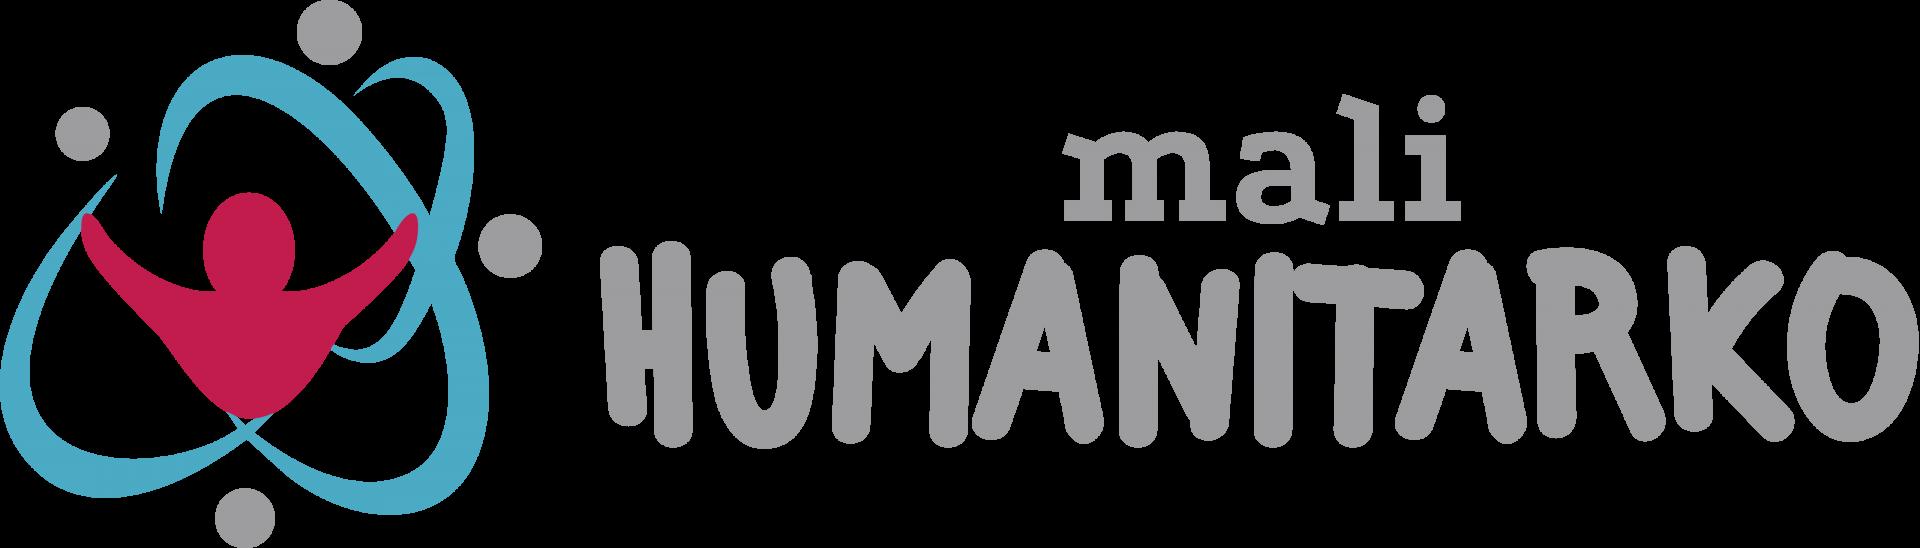 Mali humanitarko logo